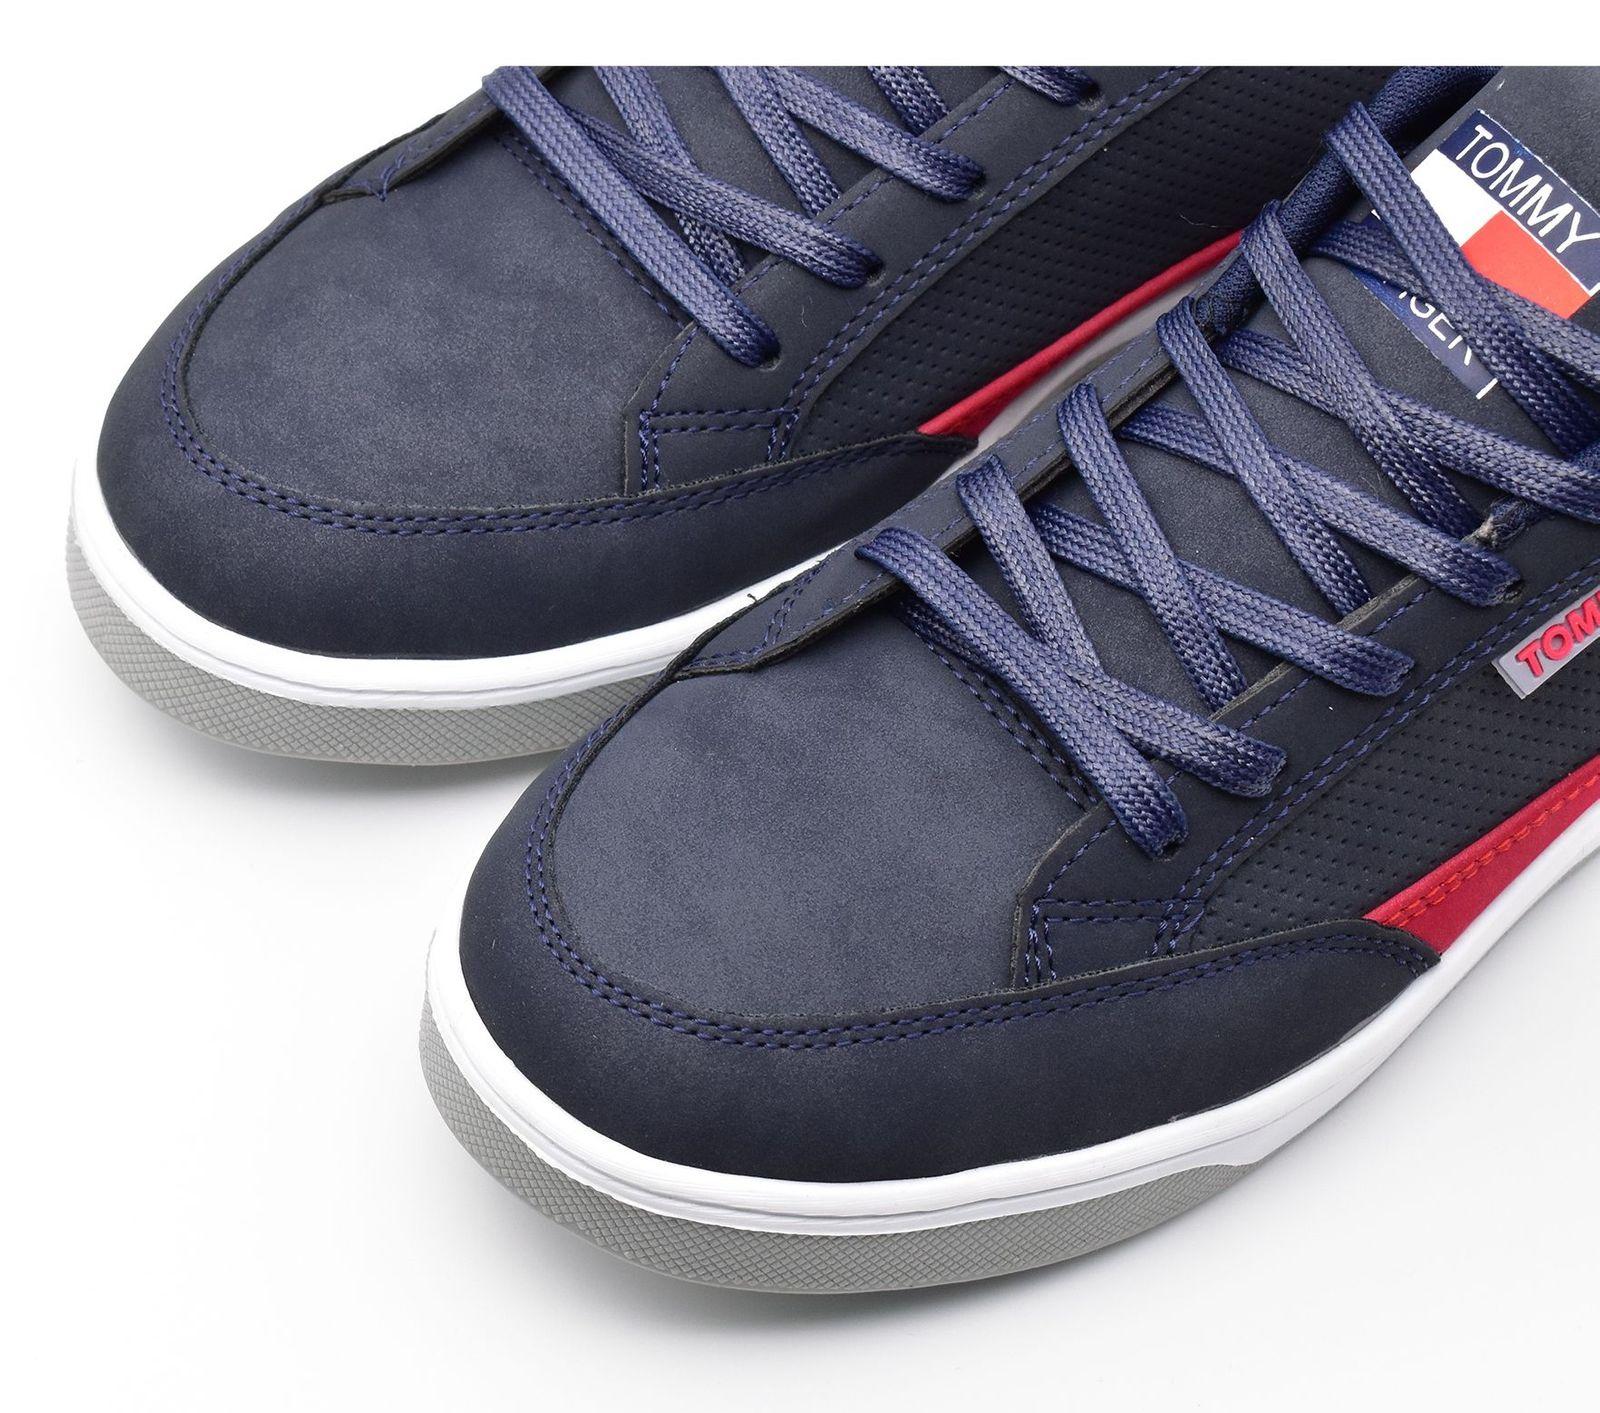 کفش روزمره مردانه مدل رهاورد کد 5513 -  - 4